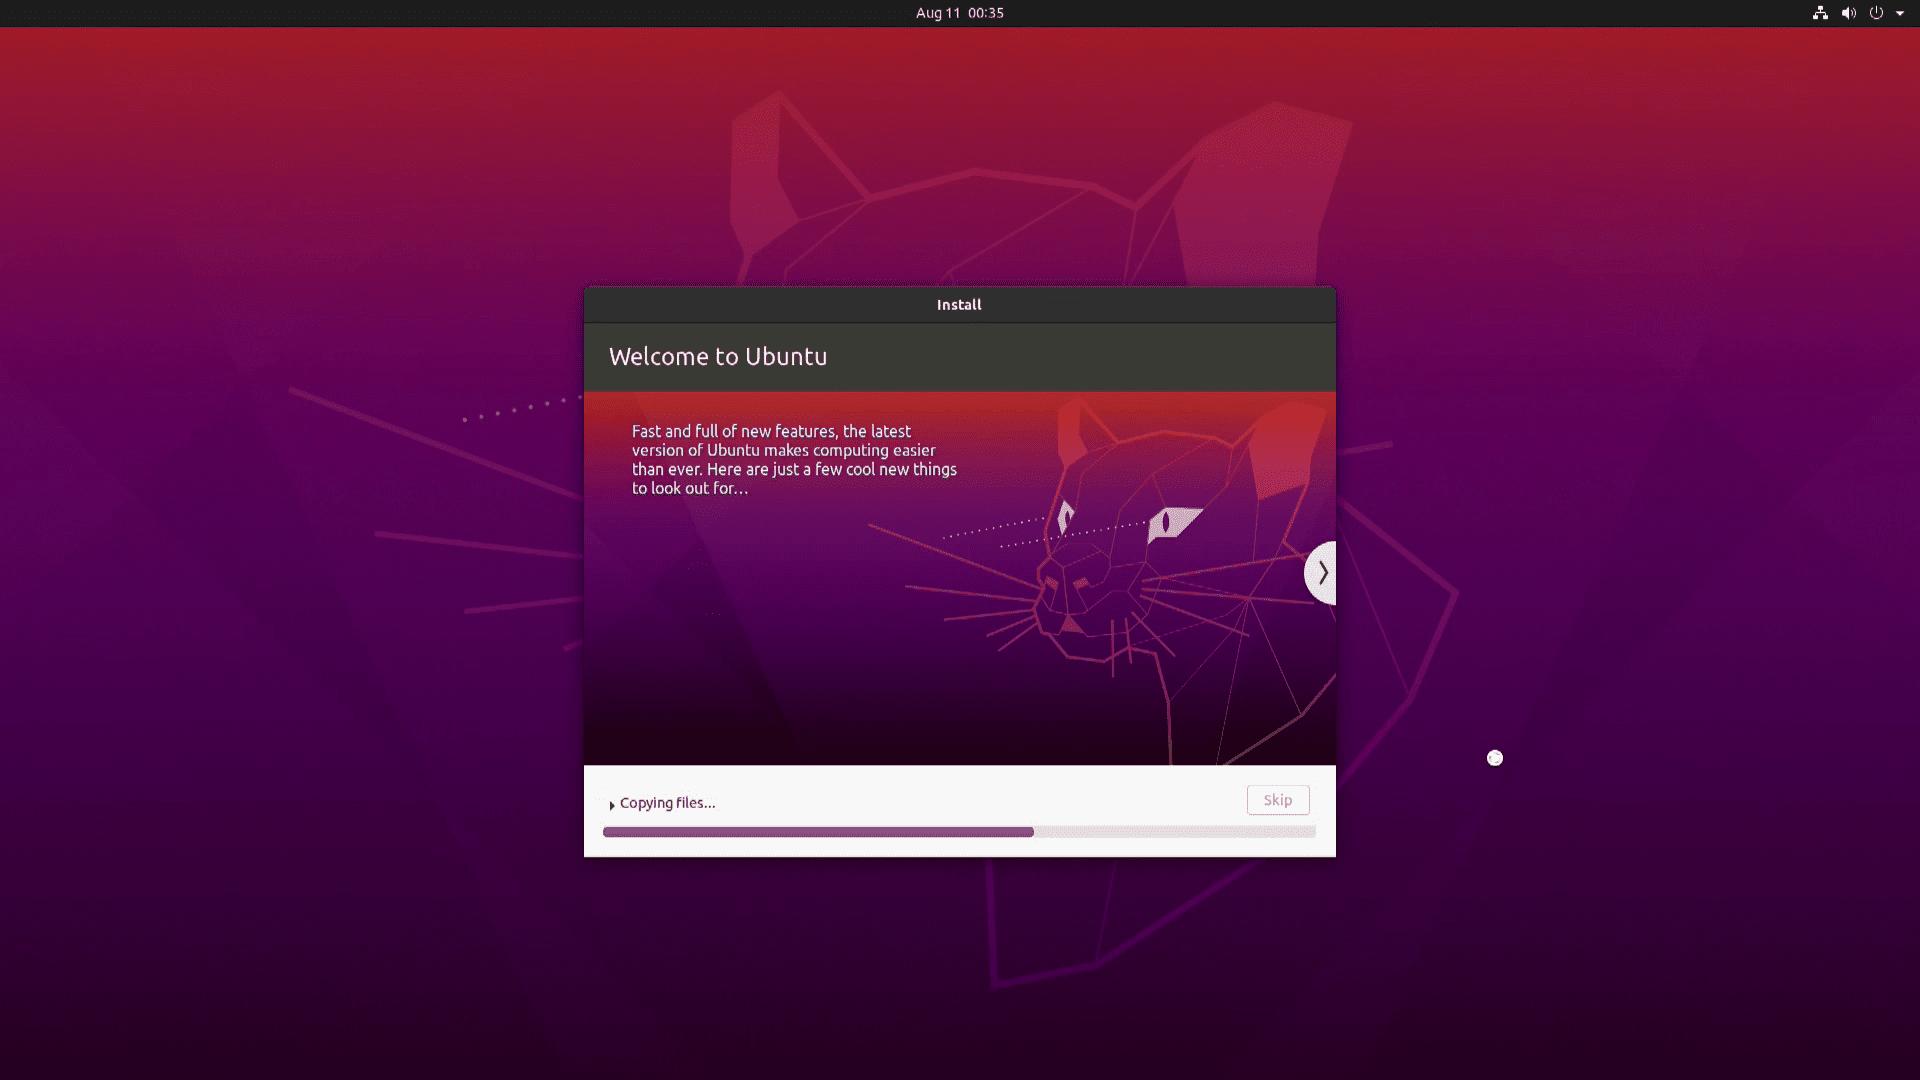 A screenshot of Ubuntu installing.